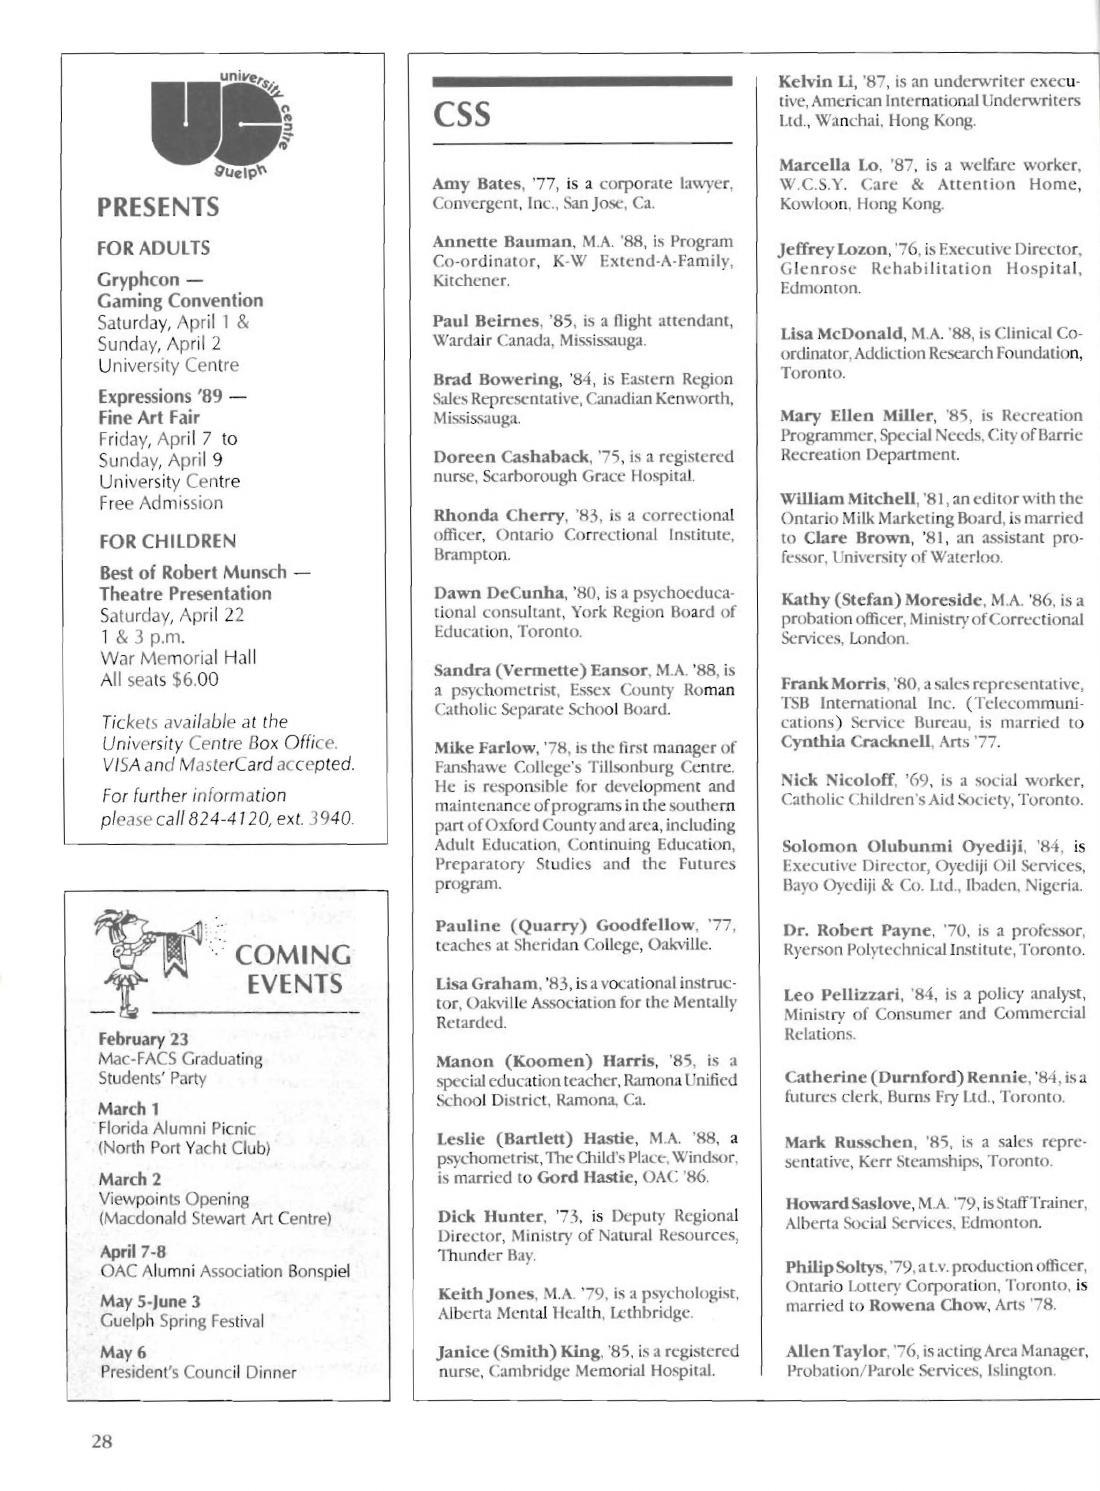 Guelph Alumnus Magazine, Winter 1989 by University of Guelph - issuu